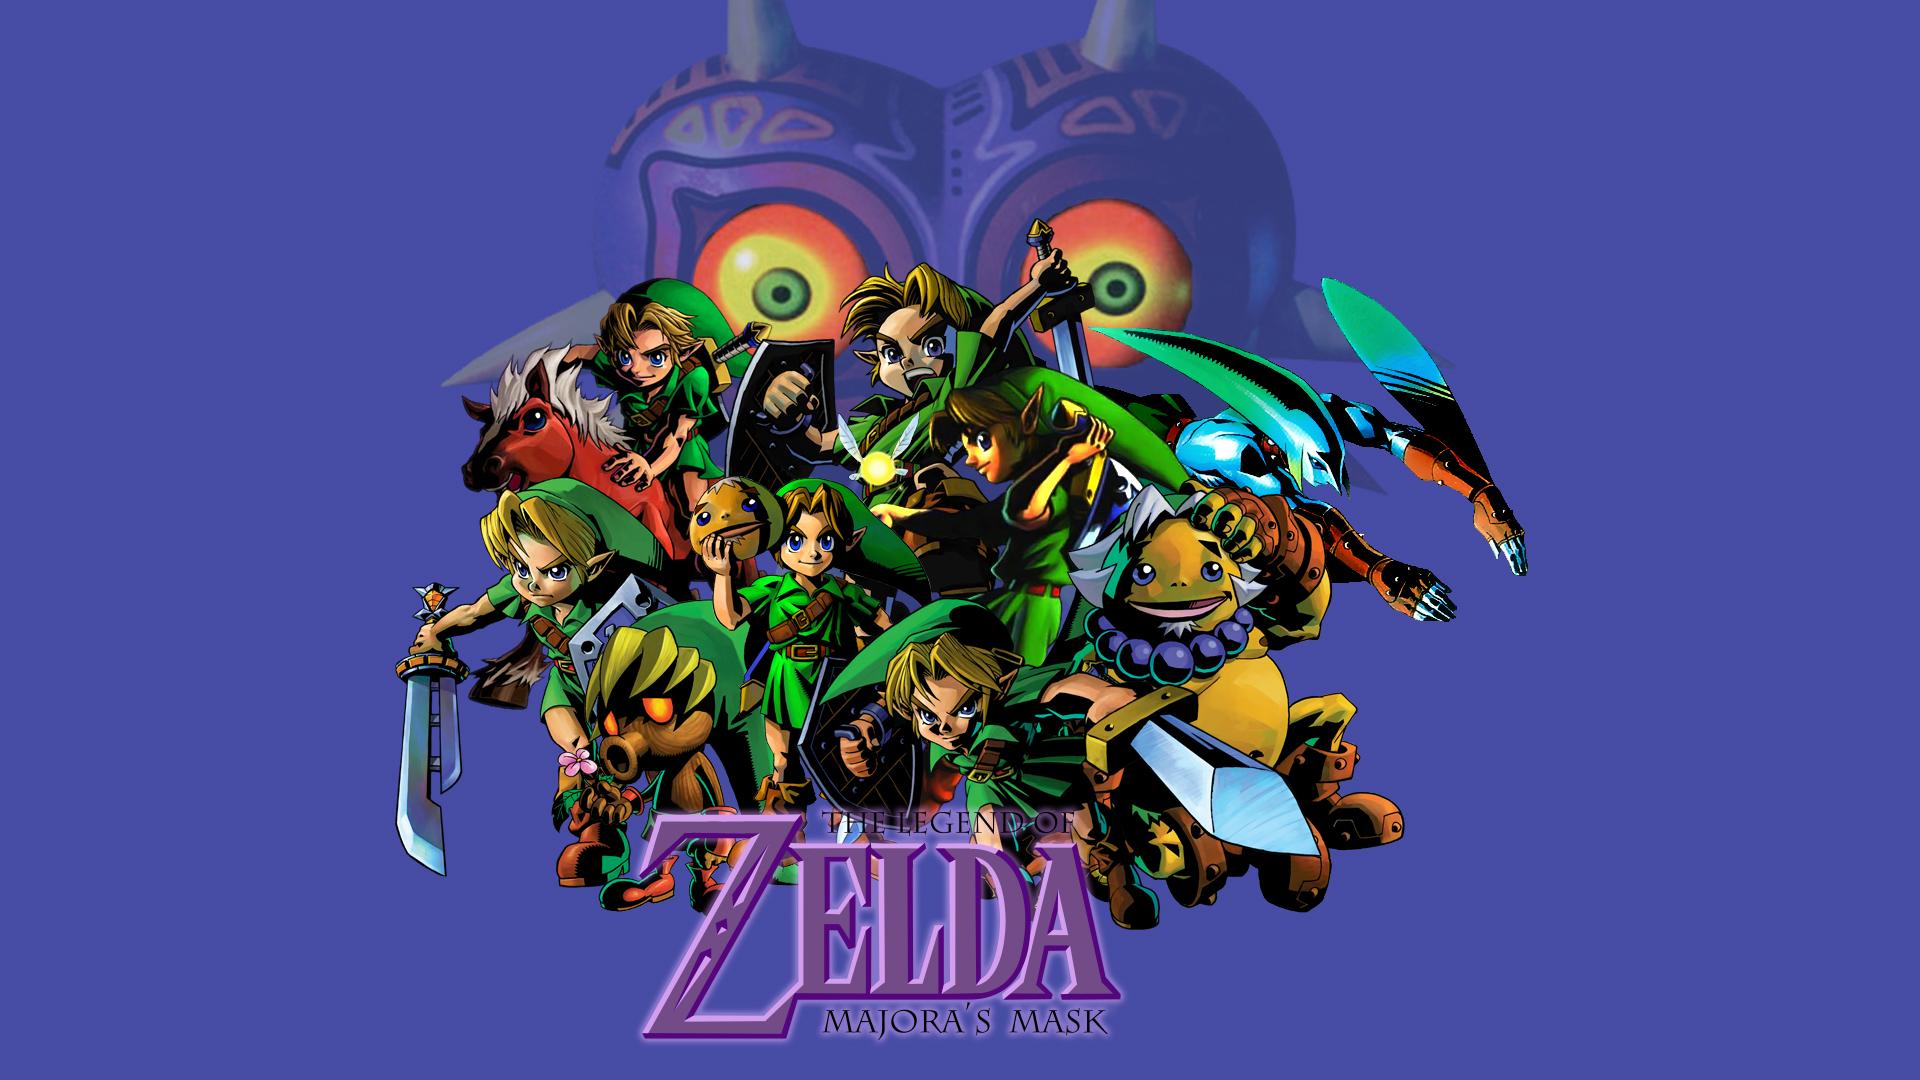 The Legend of Zelda Majora's Mask wallpaper